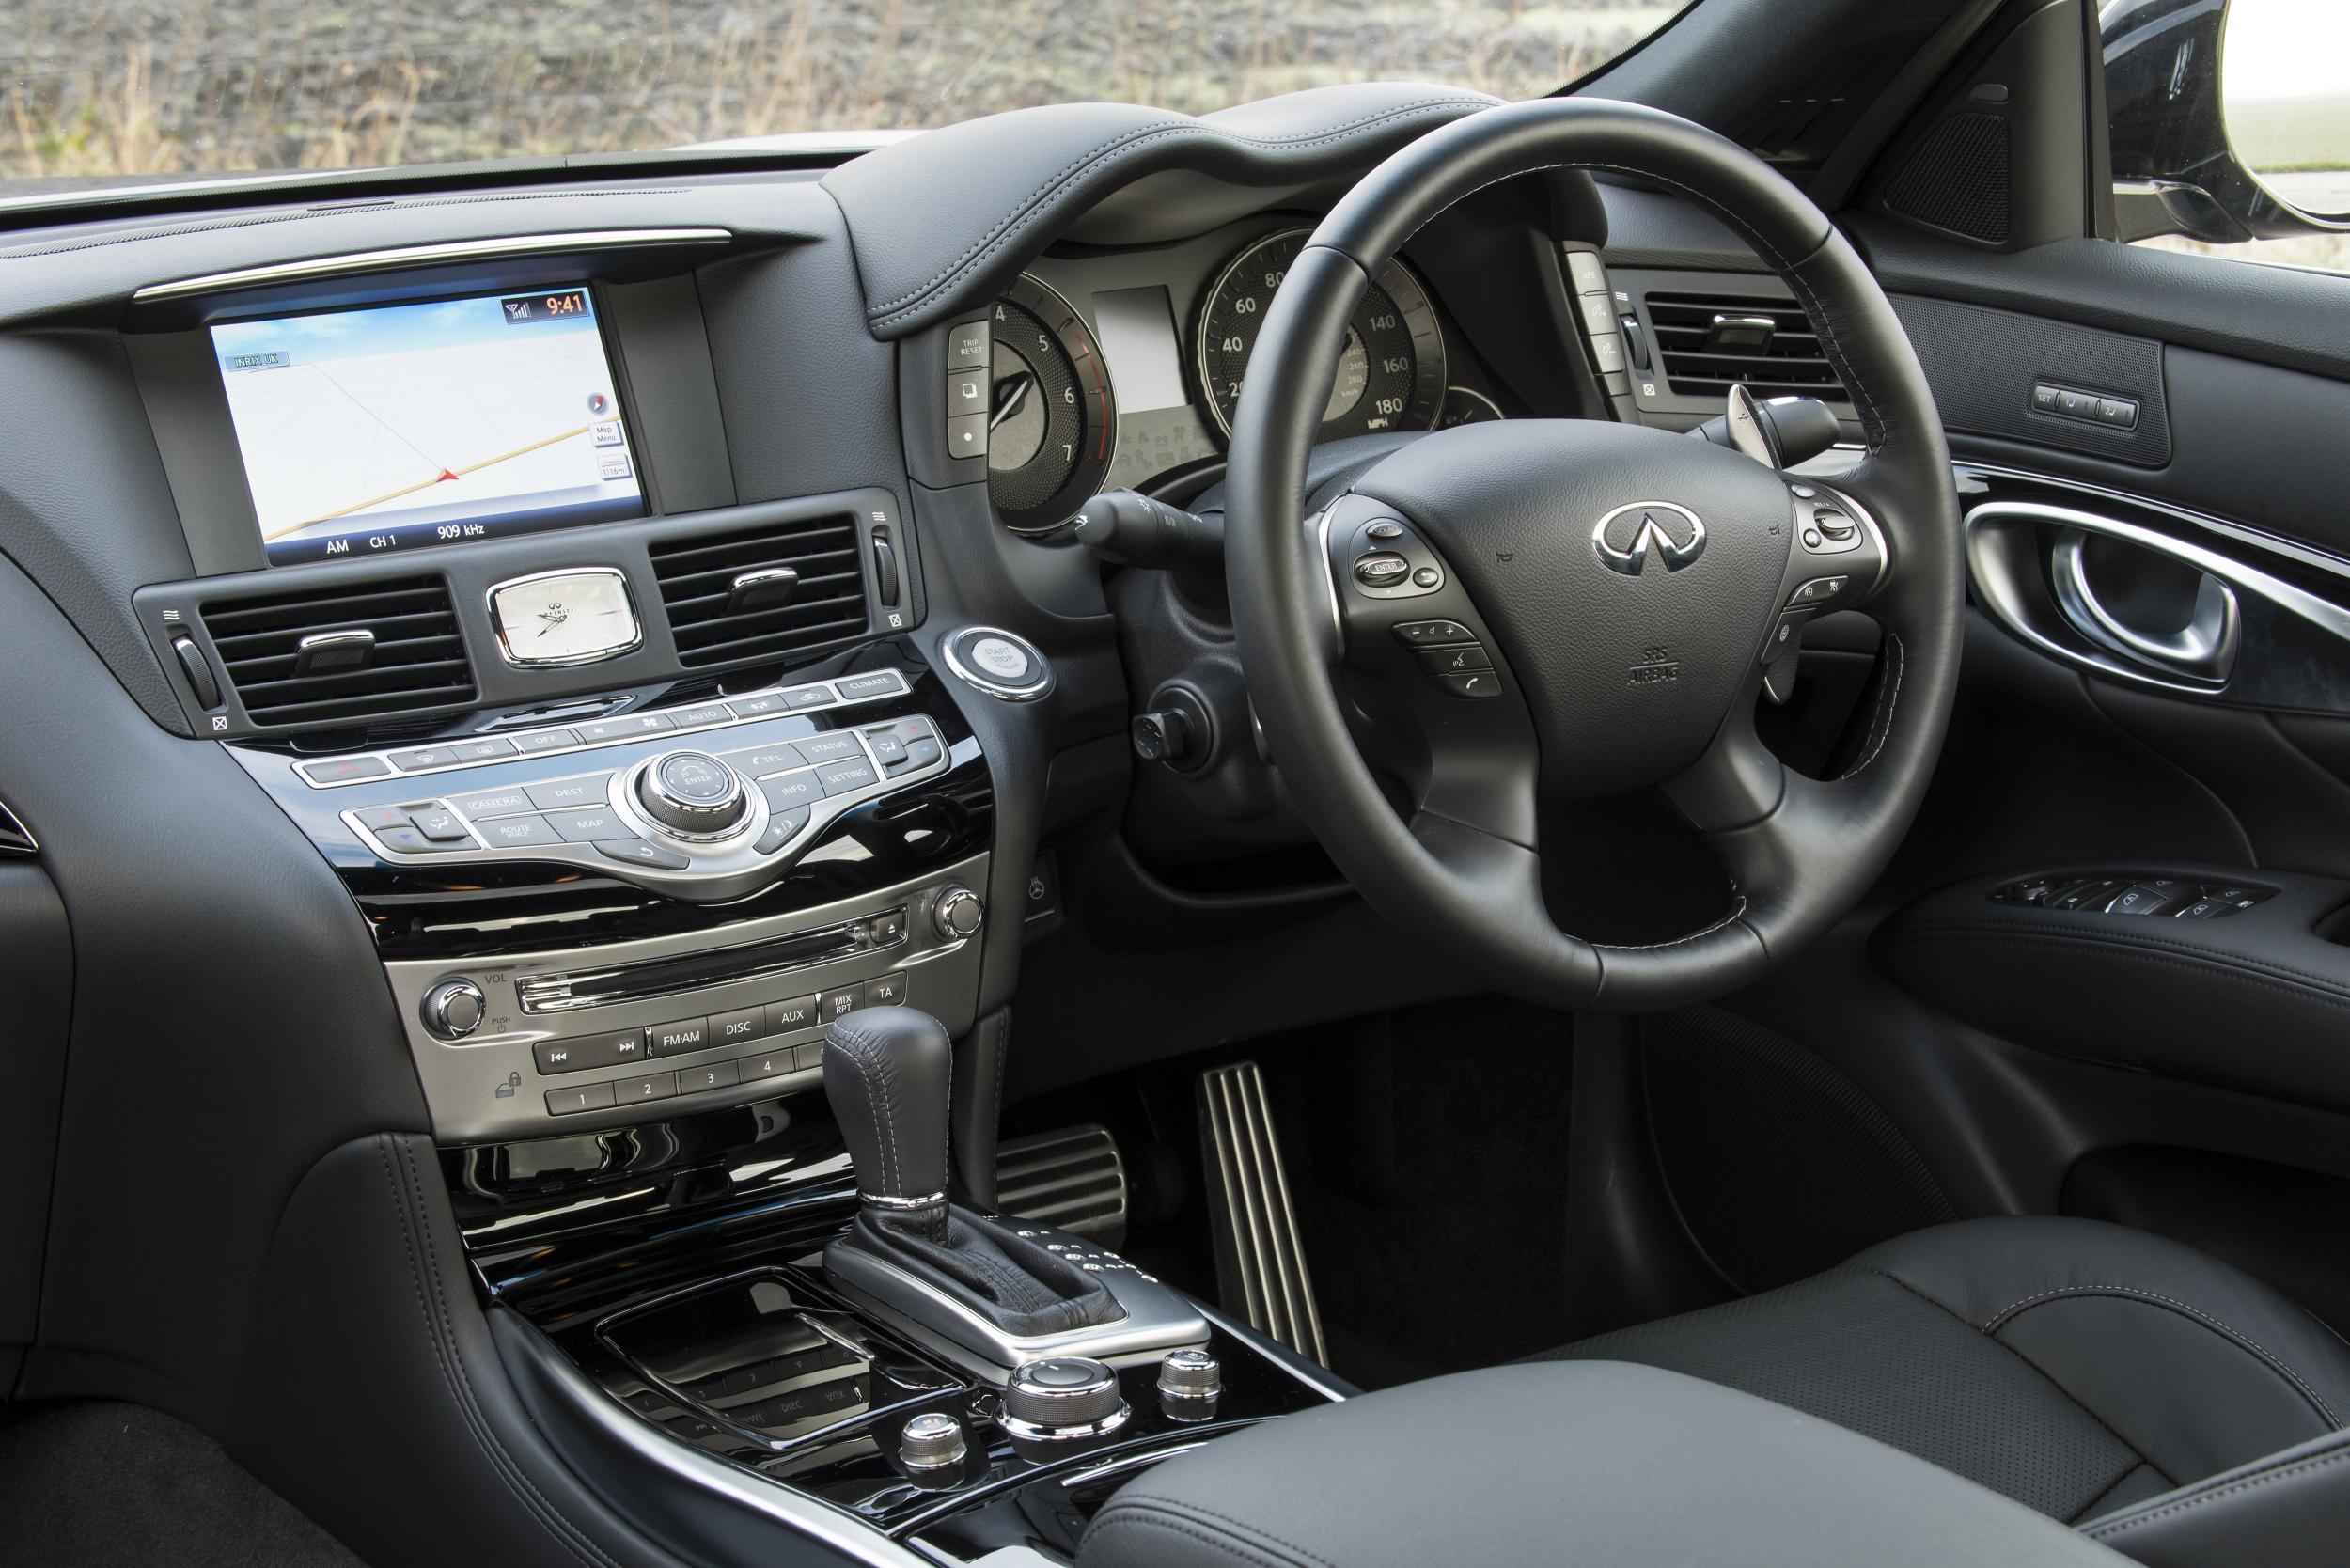 2015 Infiniti Q70 Pricing Announced for the UK - autoevolution